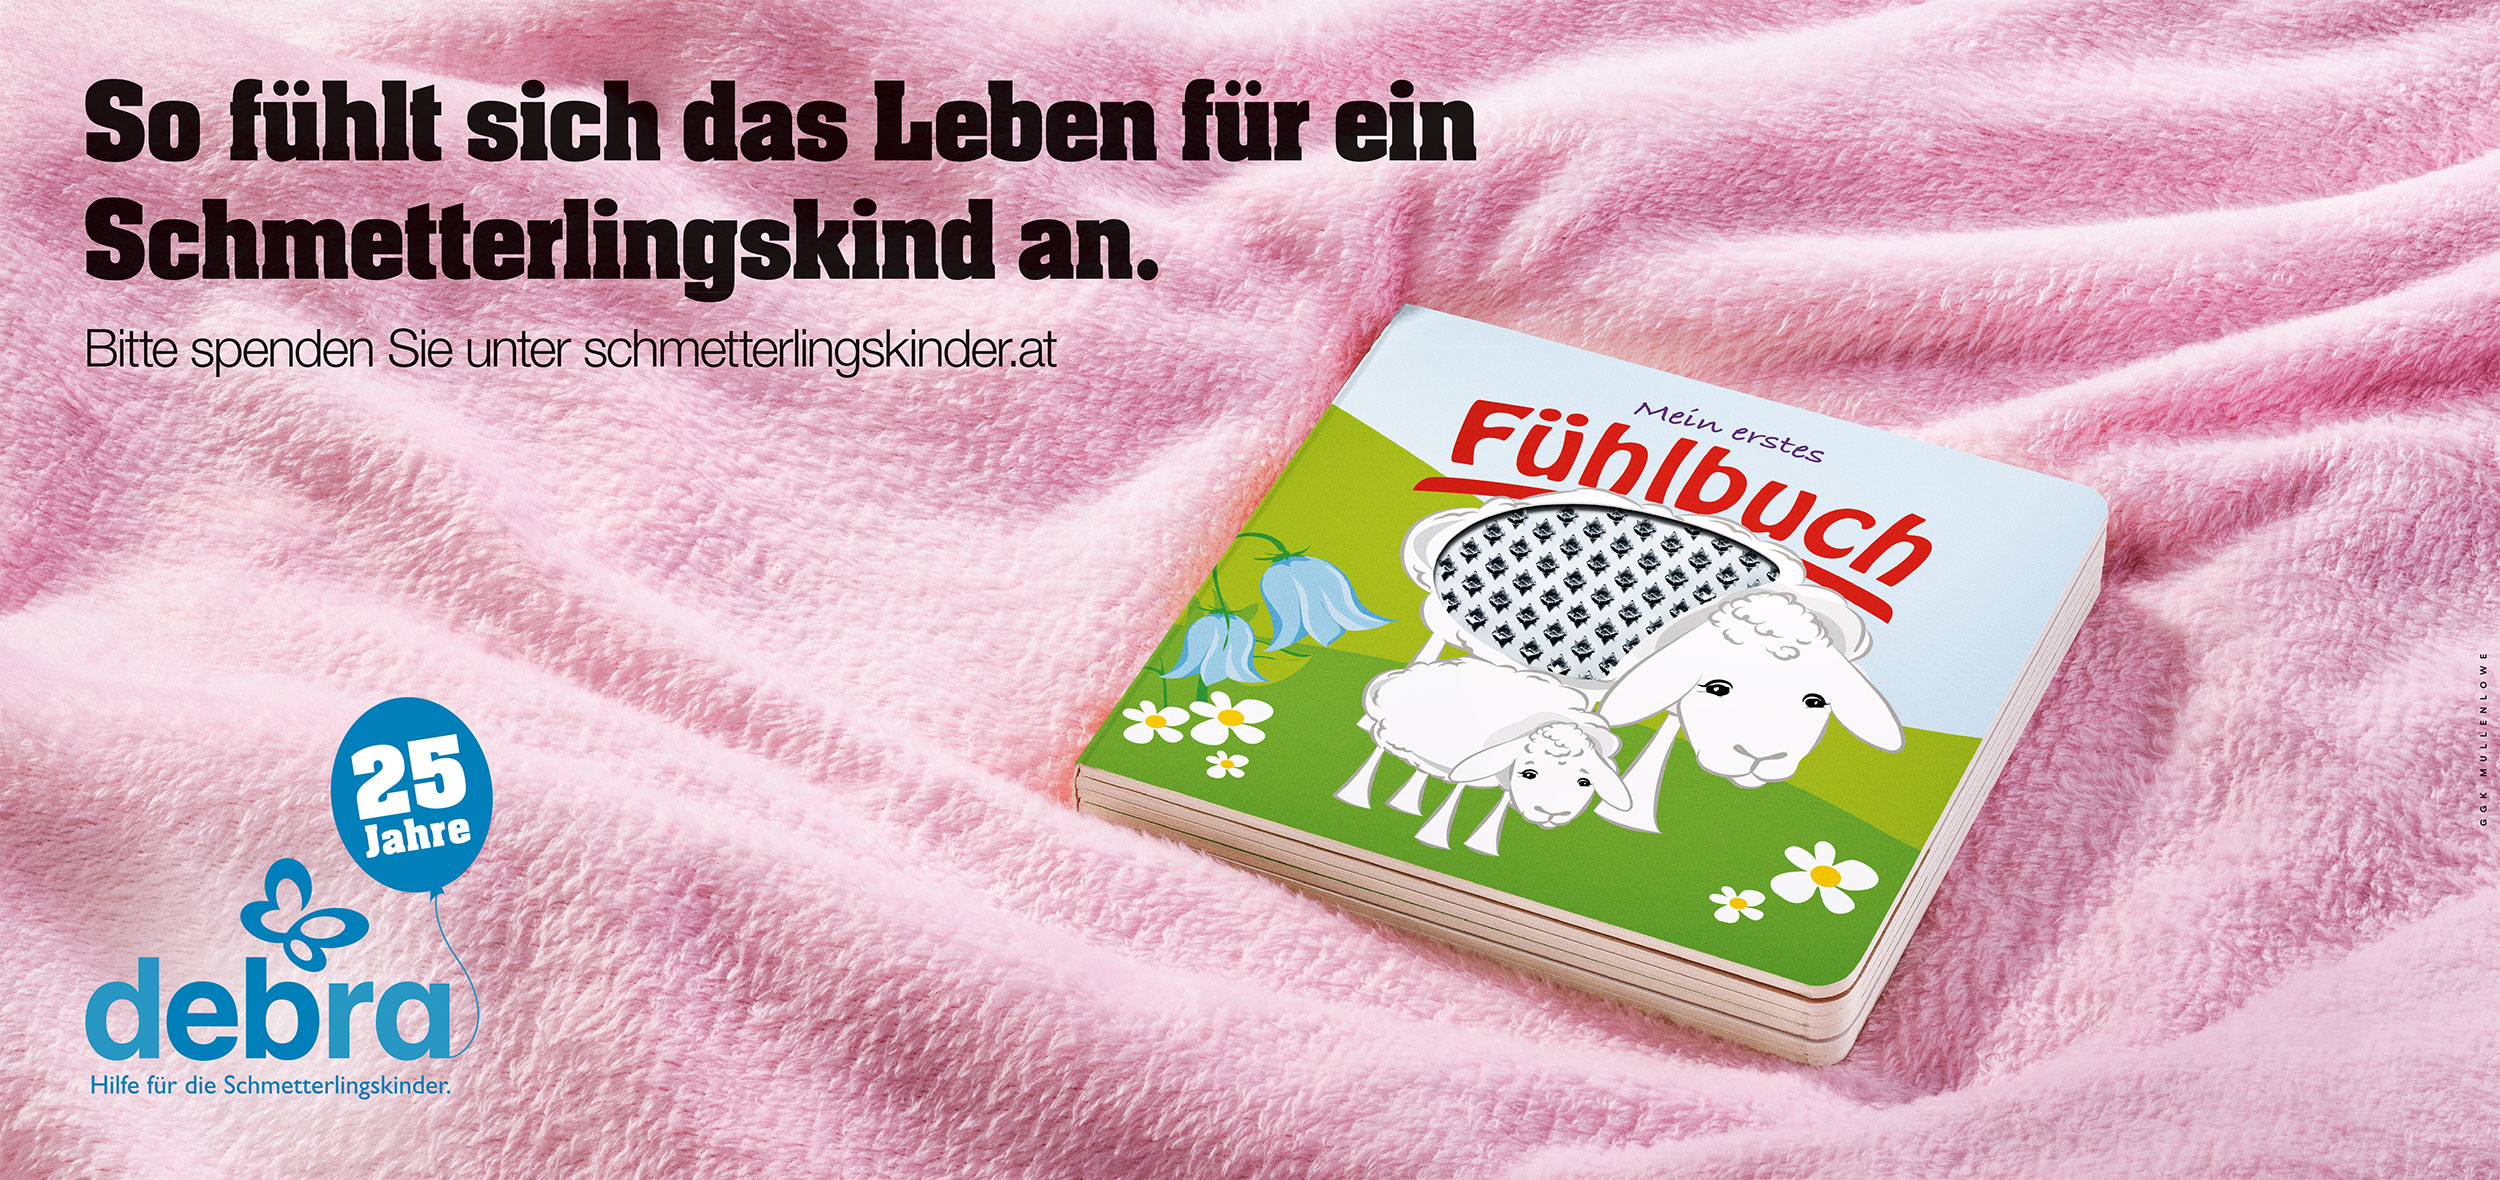 Blaupapier Fotografie Cgi Bildretusche Litho Debra Fuehlbuch 24BG